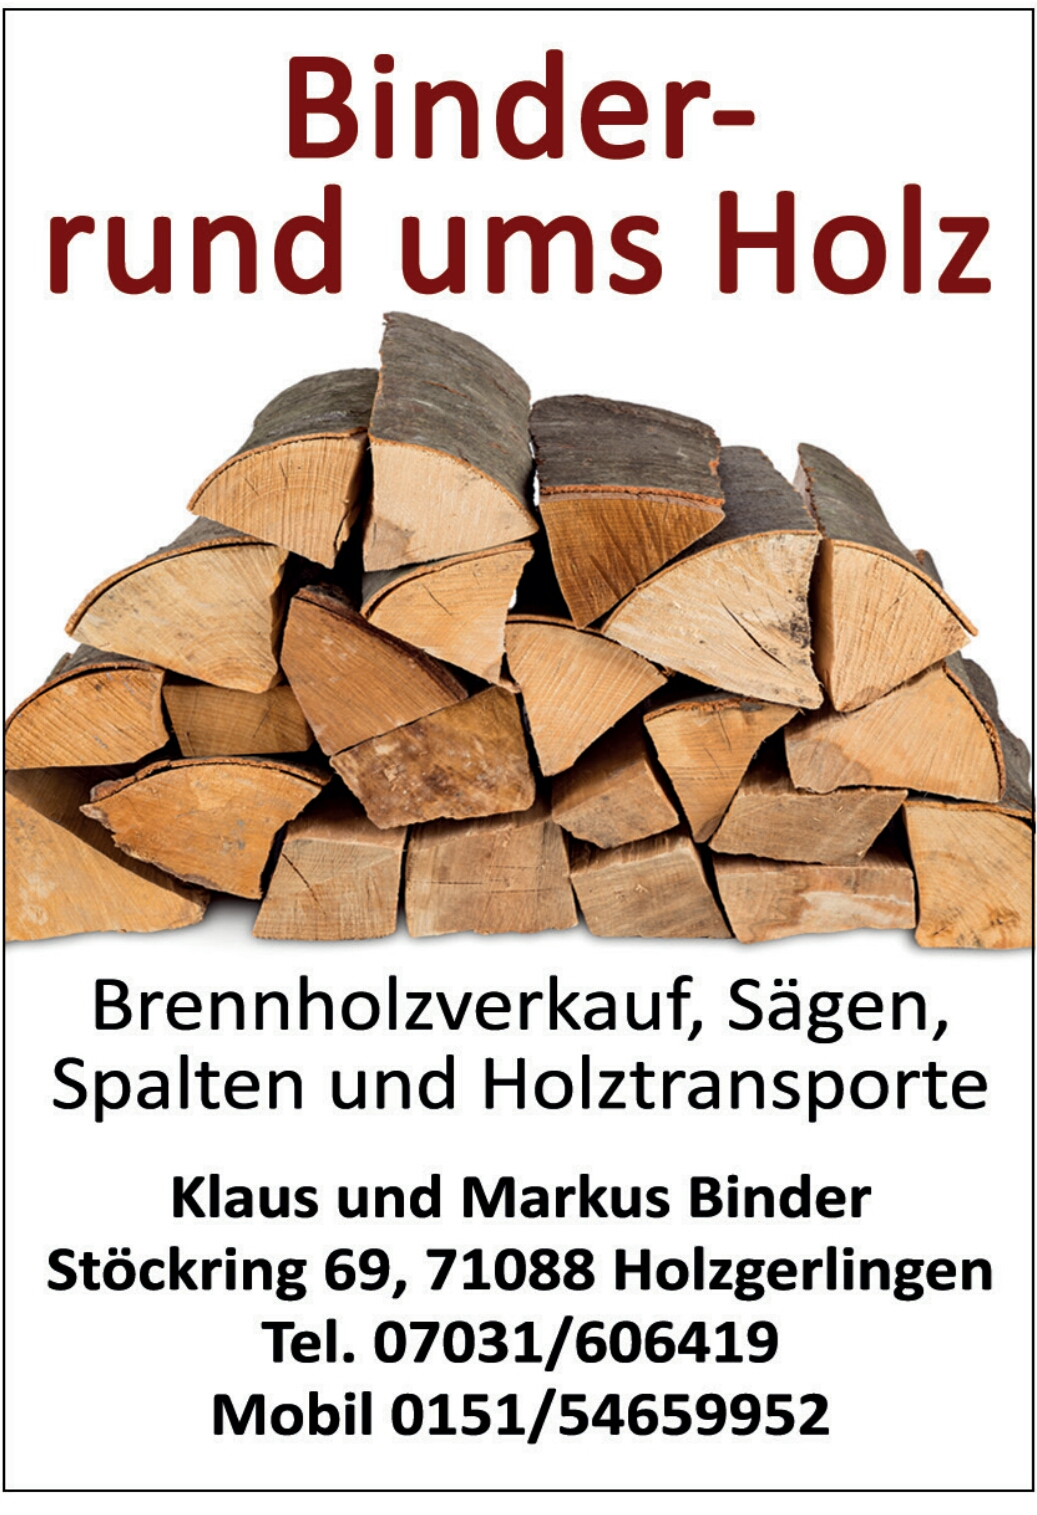 Super Angebot: Brennholz Buche Hartholz - 71088 Holzgerlingen - 1 m³ NF39